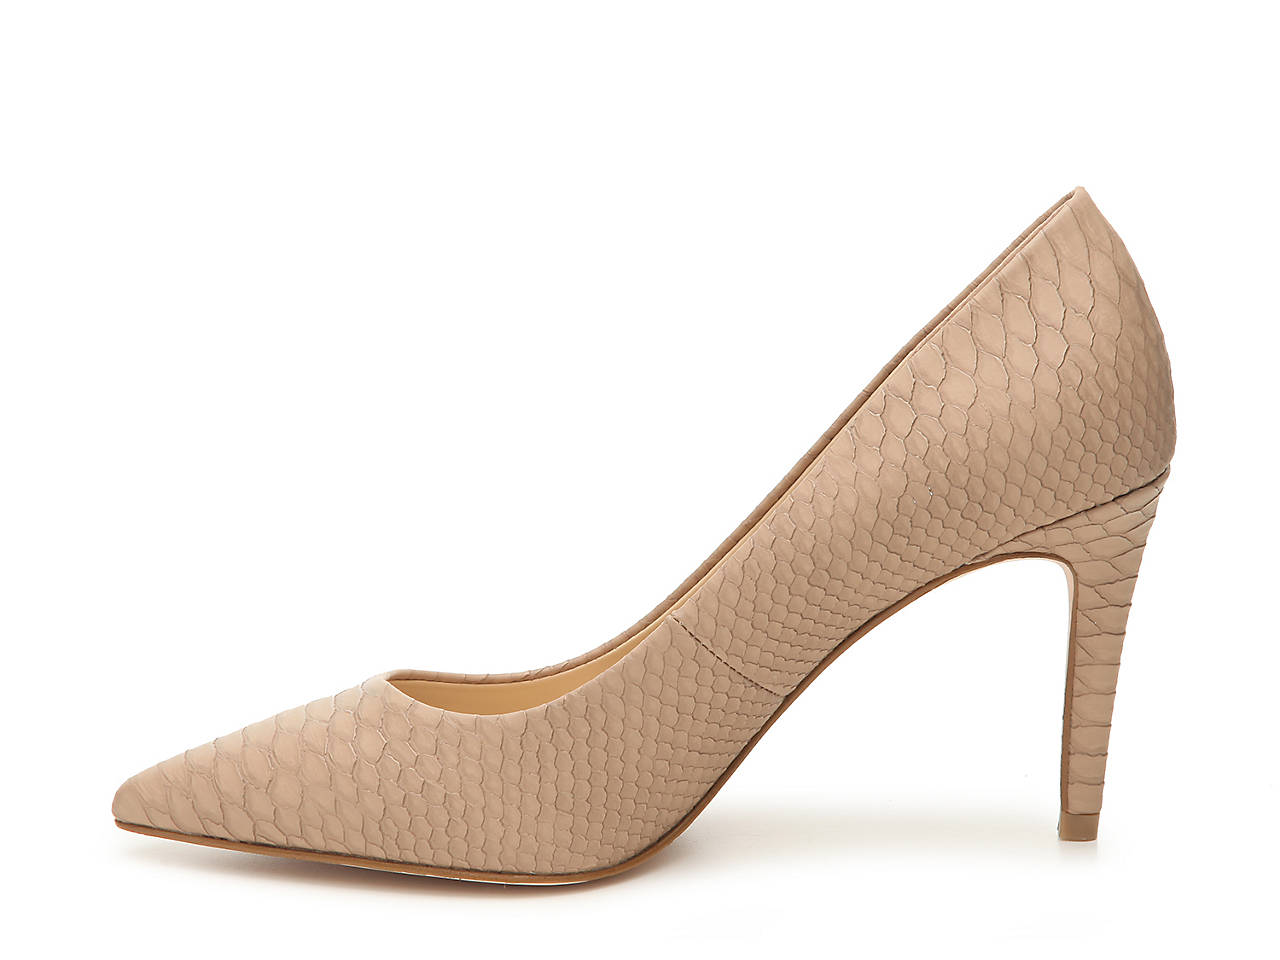 35c02337ef40 Jessica Simpson Carpena Pump Women s Shoes